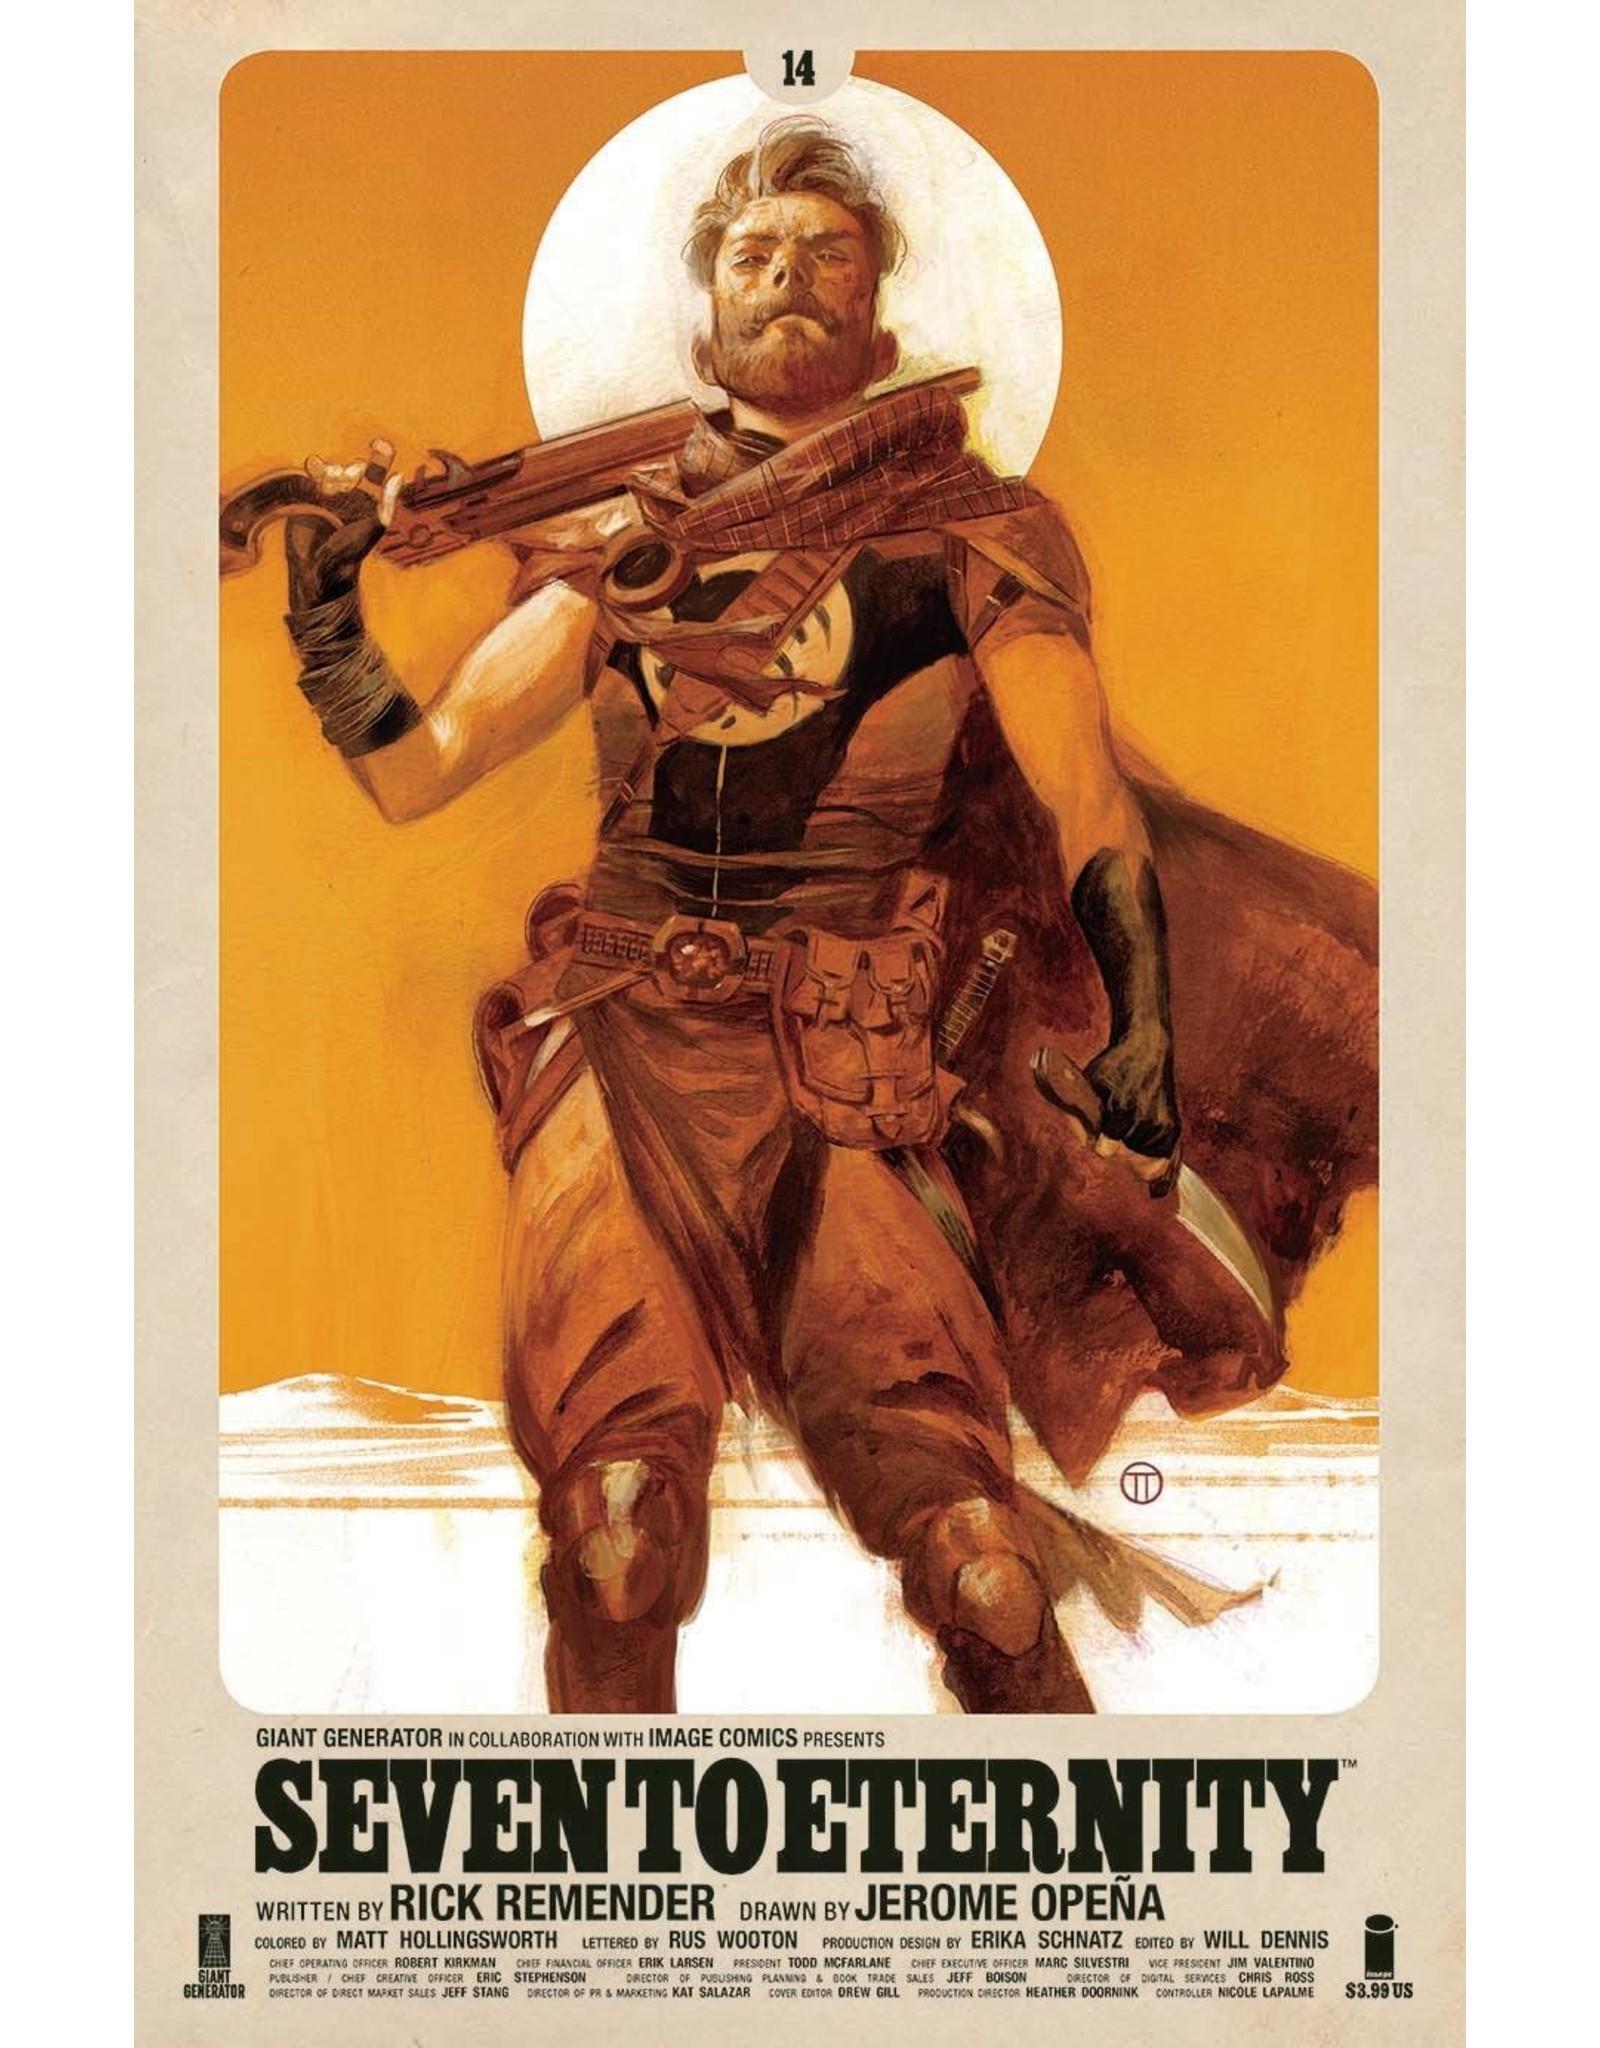 IMAGE COMICS SEVEN TO ETERNITY #14 CVR B TEDESCO